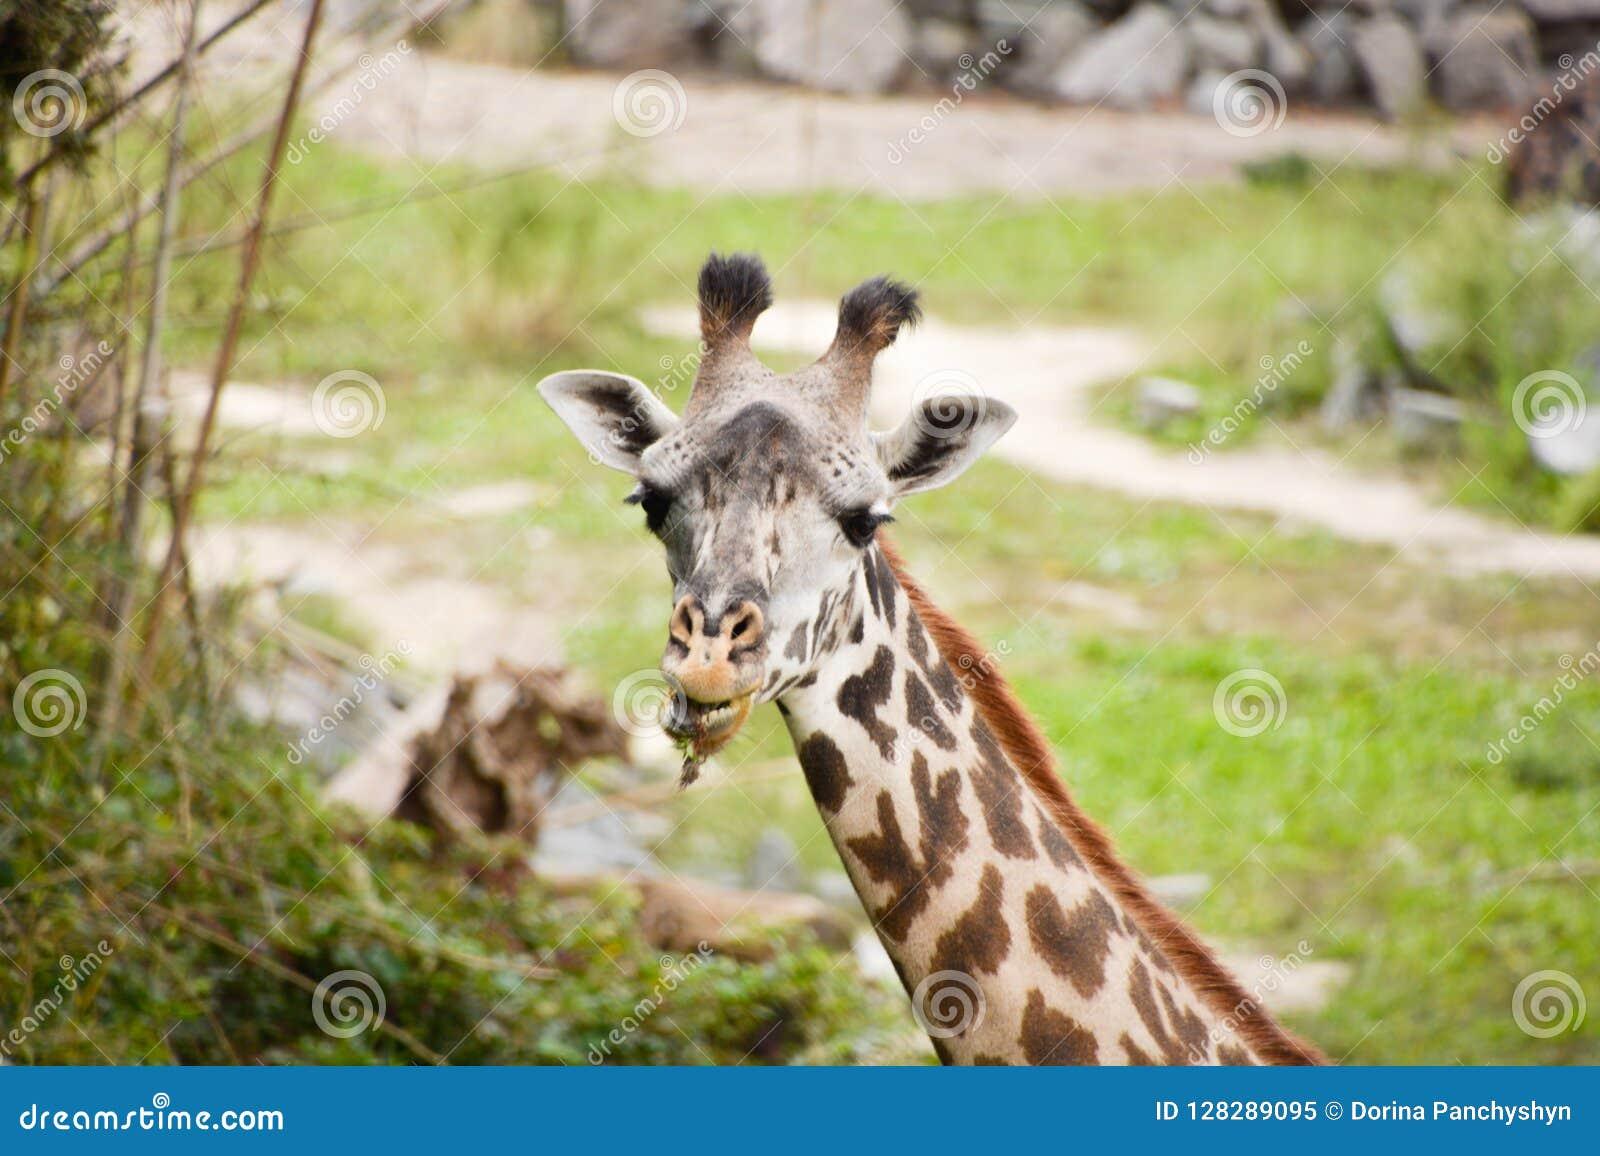 En dag på zooen